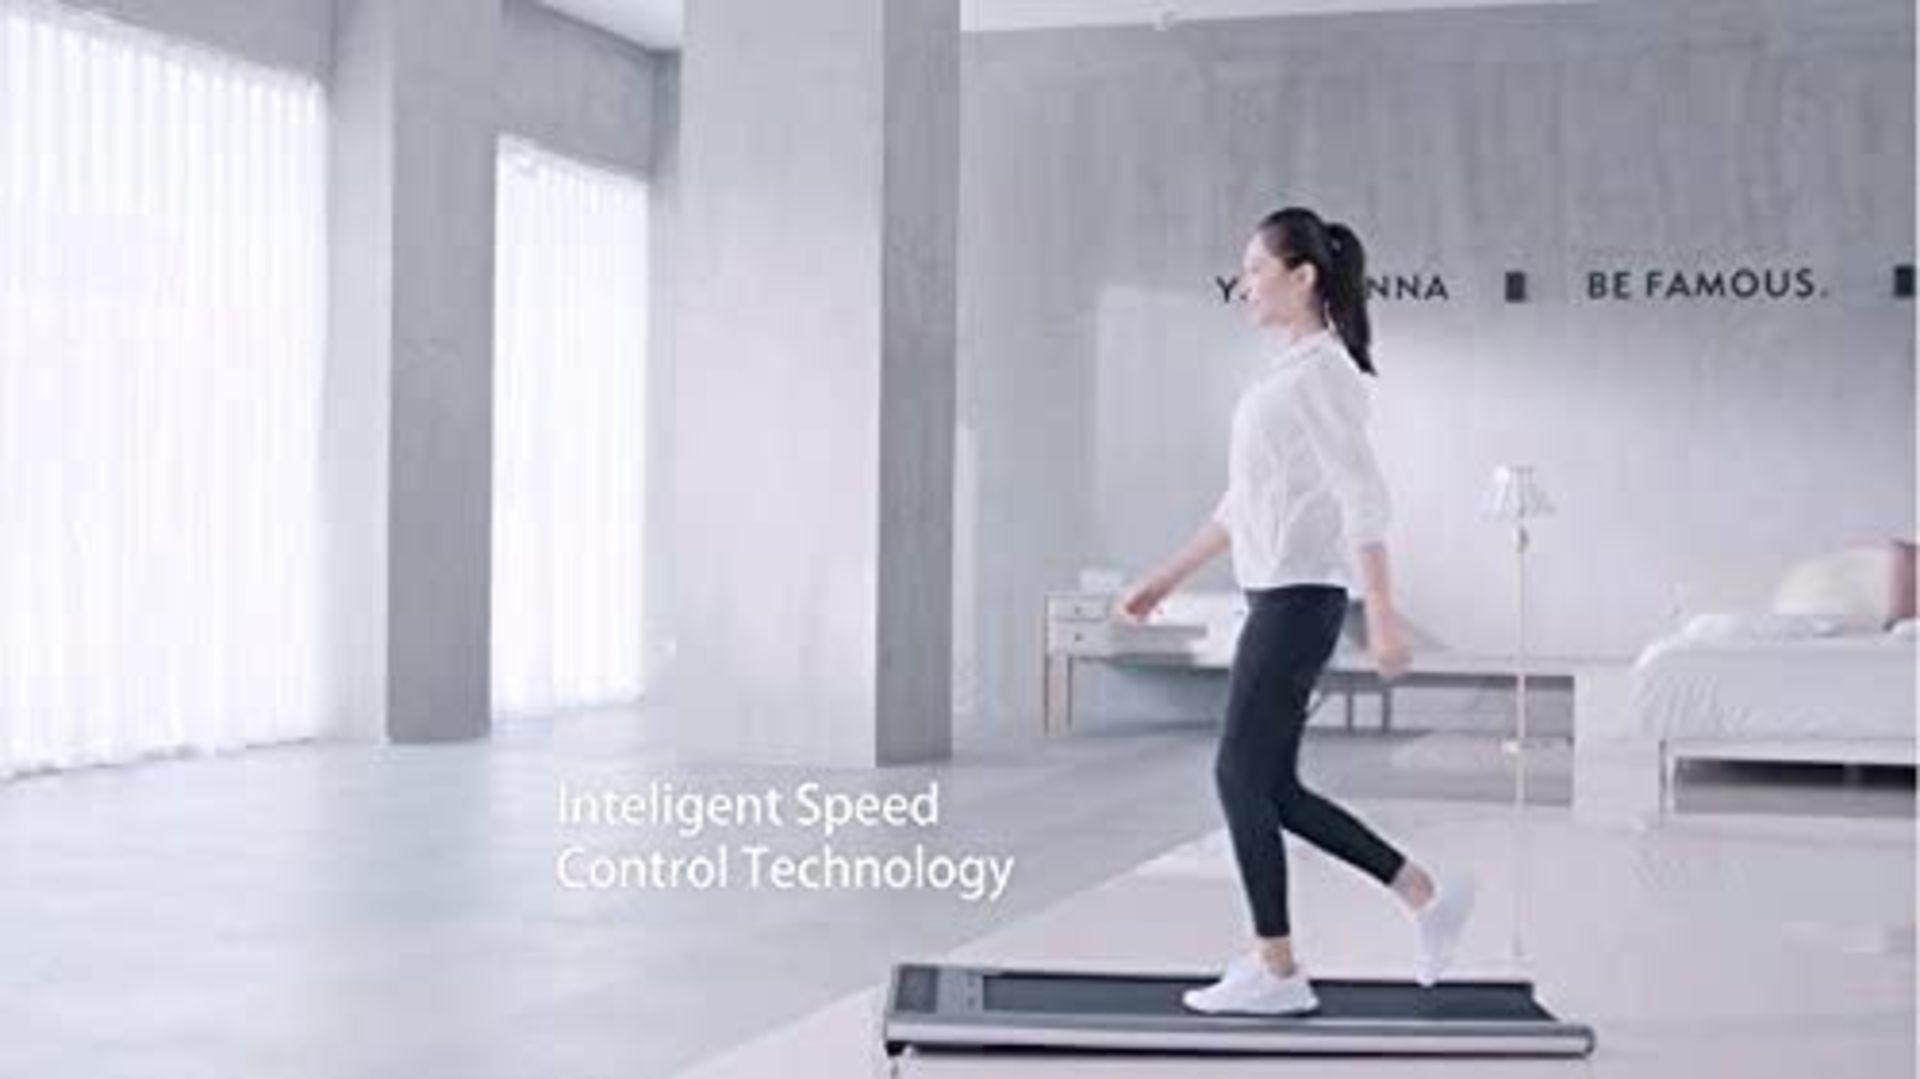 1 x Slim Tread Ultra Thin Smart Treadmill Running / Walking Machine - Lightweight With Folding - Image 19 of 23